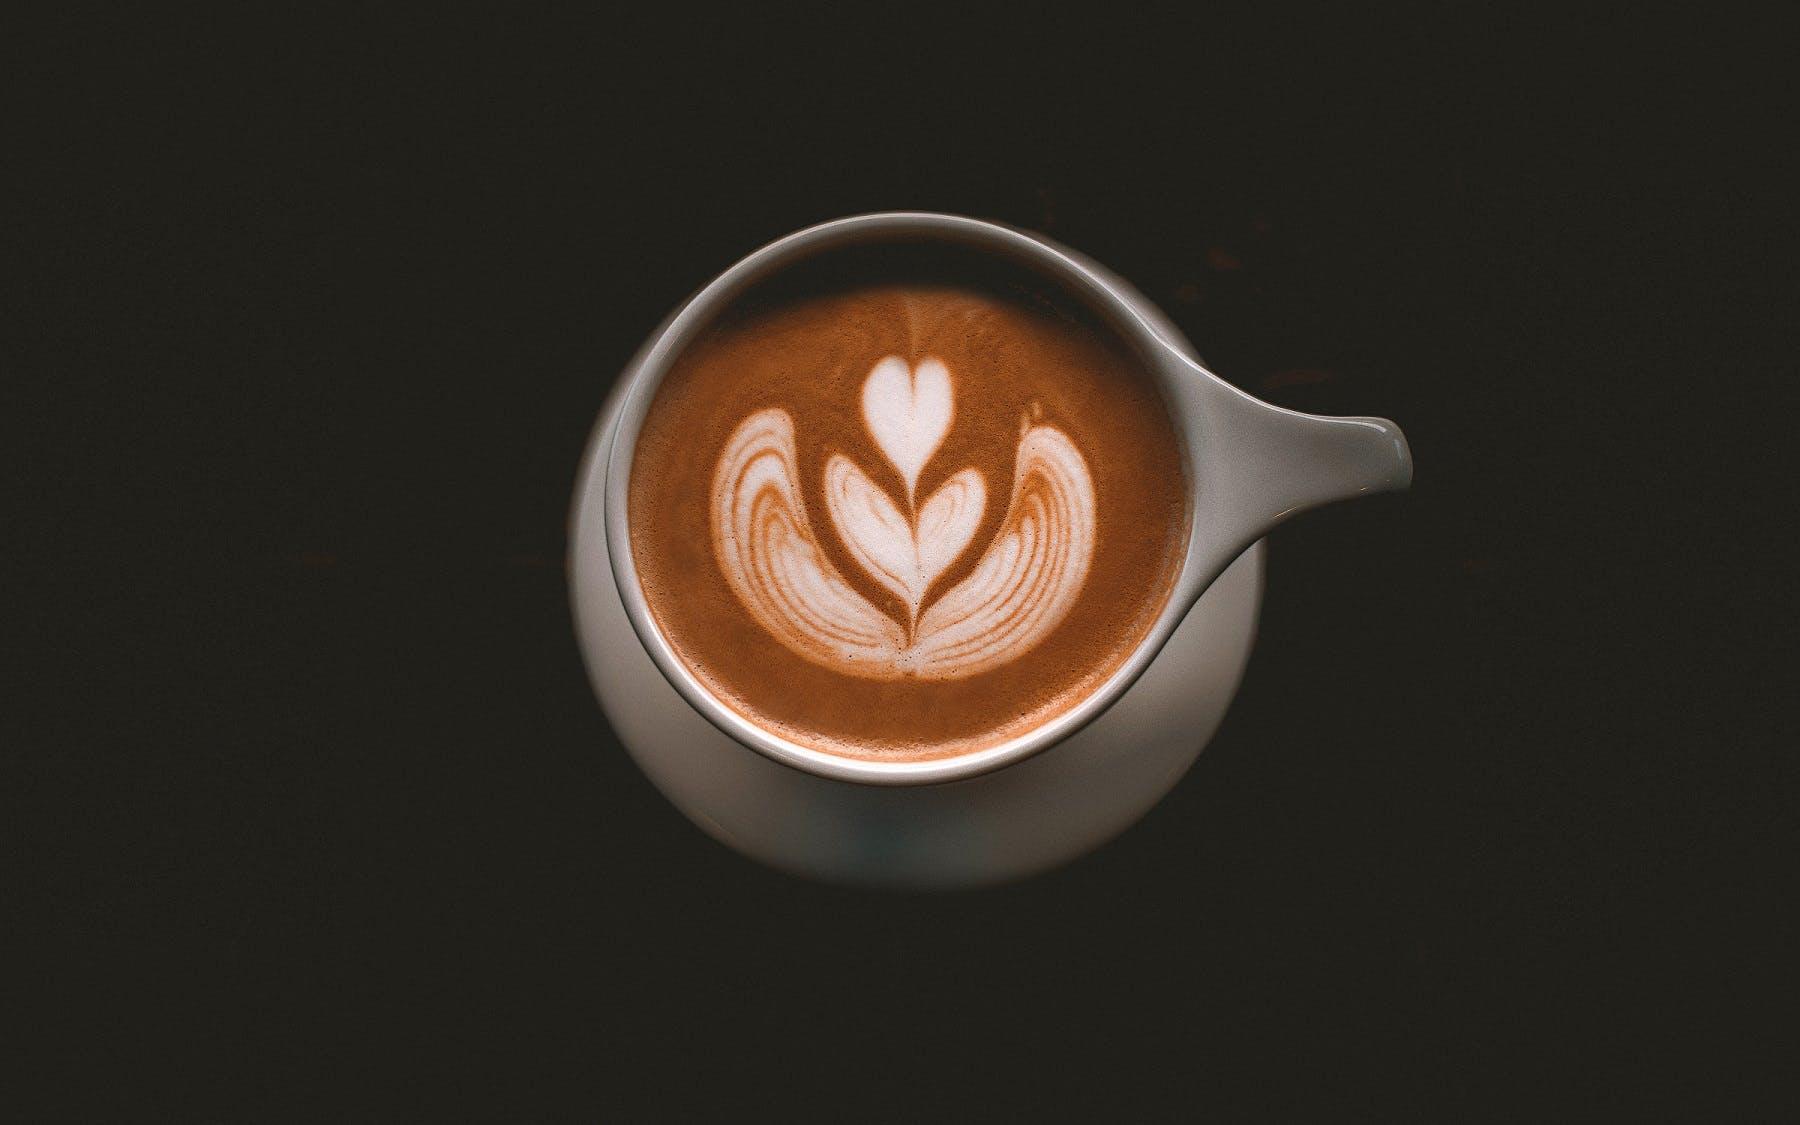 Kostenloses Stock Foto zu becher, cappuccino, dunkel, espresso